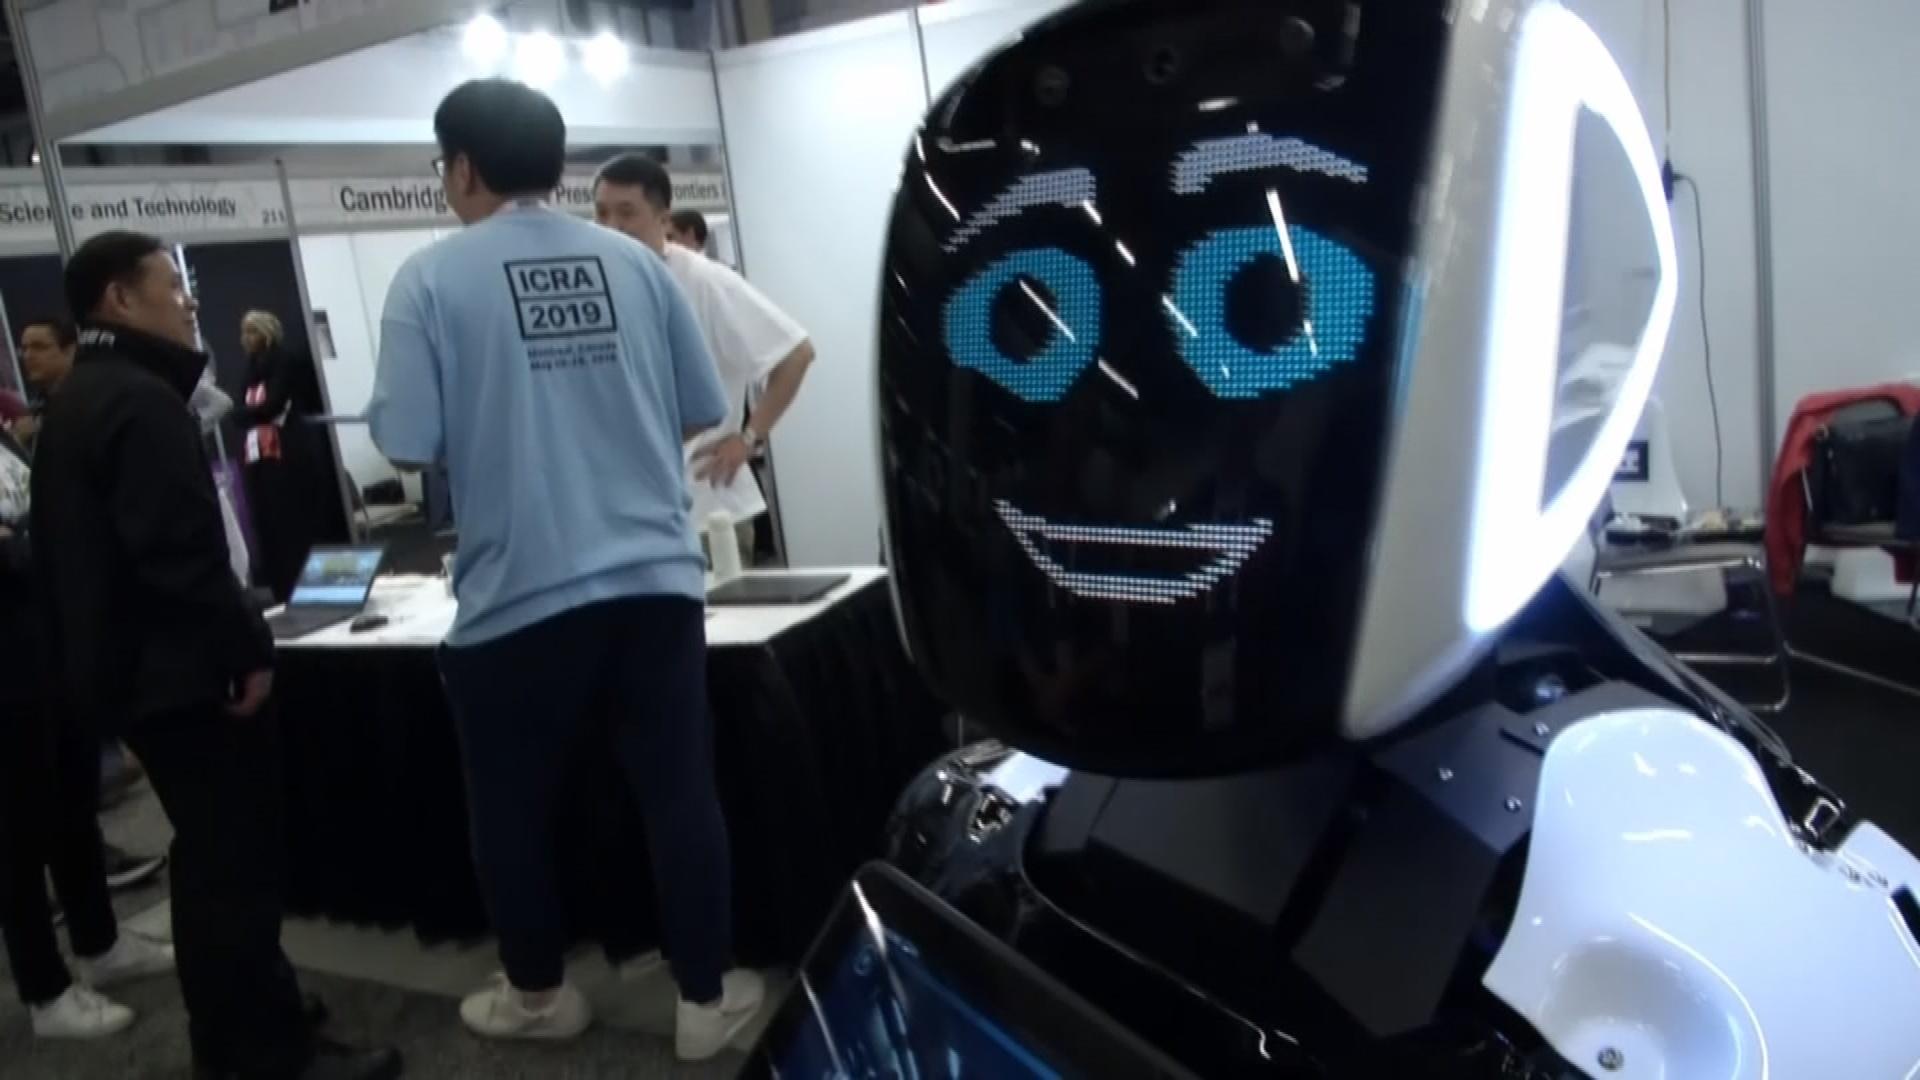 Robotics comes into 'maturity' at ICRA